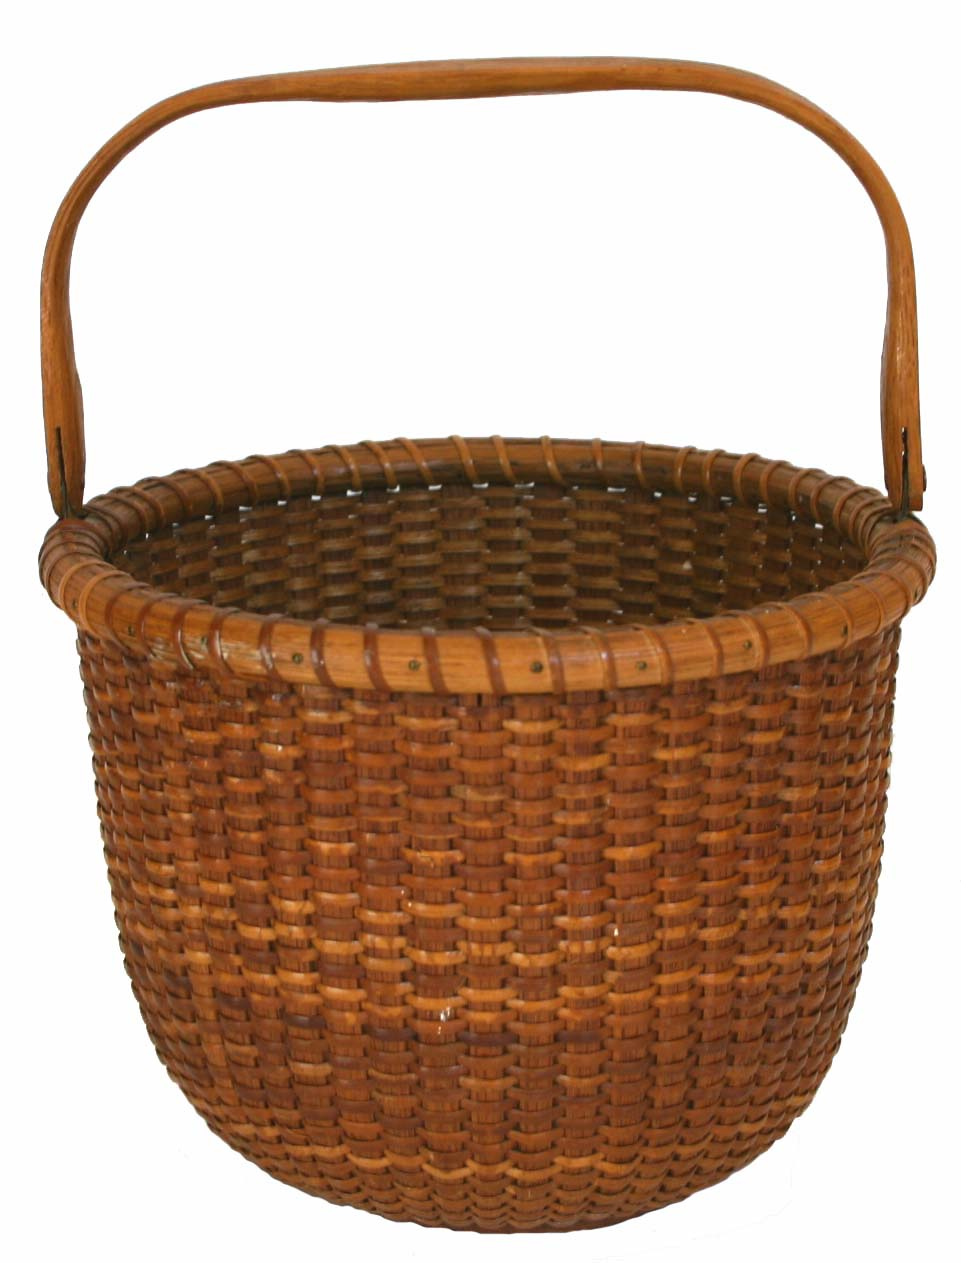 Basket Weaving Nantucket : Nantucket basket